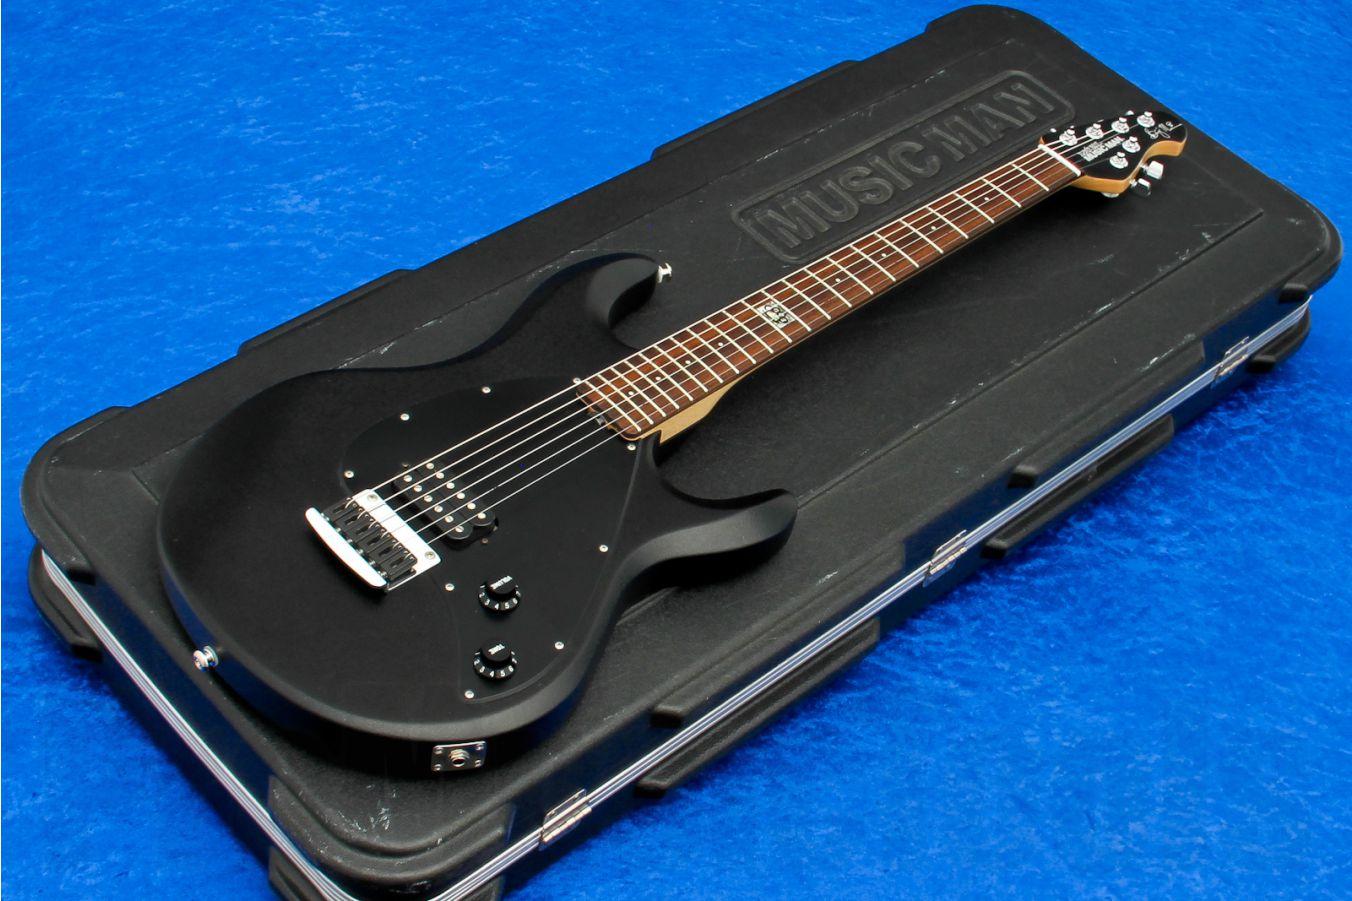 Music Man USA Silhouette Special Benji Madden T1 - Textured Black